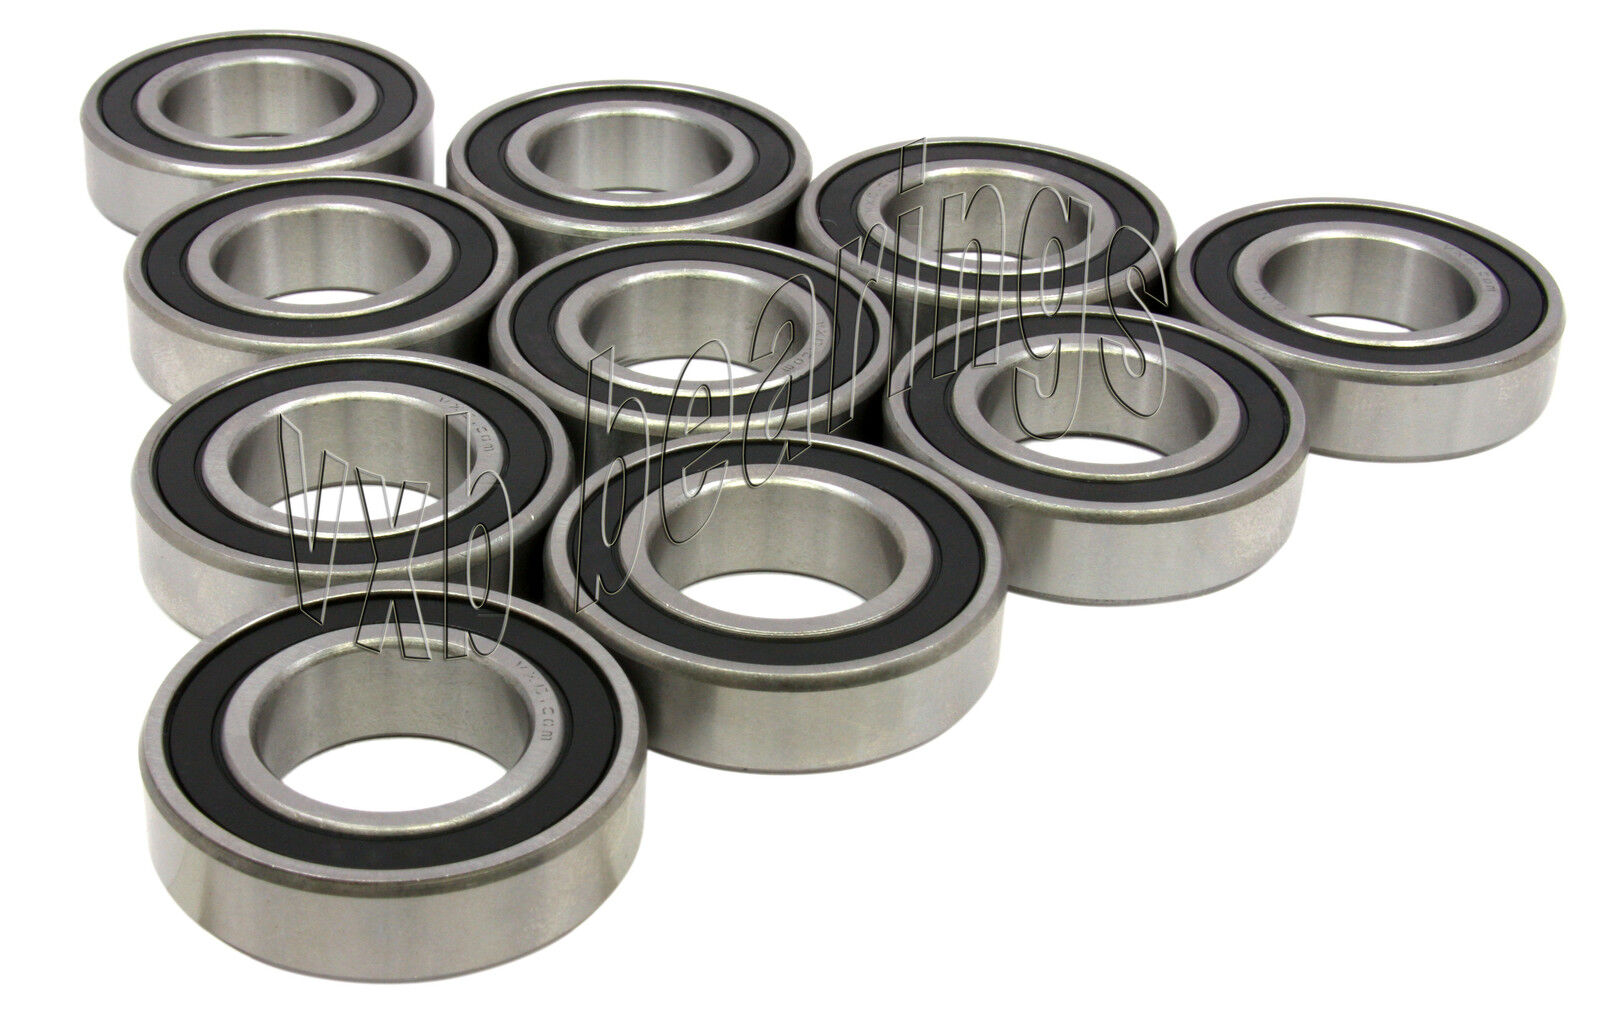 10 bearings 6202 2rs 15x35 electric motor bearing hq for Electric motor bearing lubrication